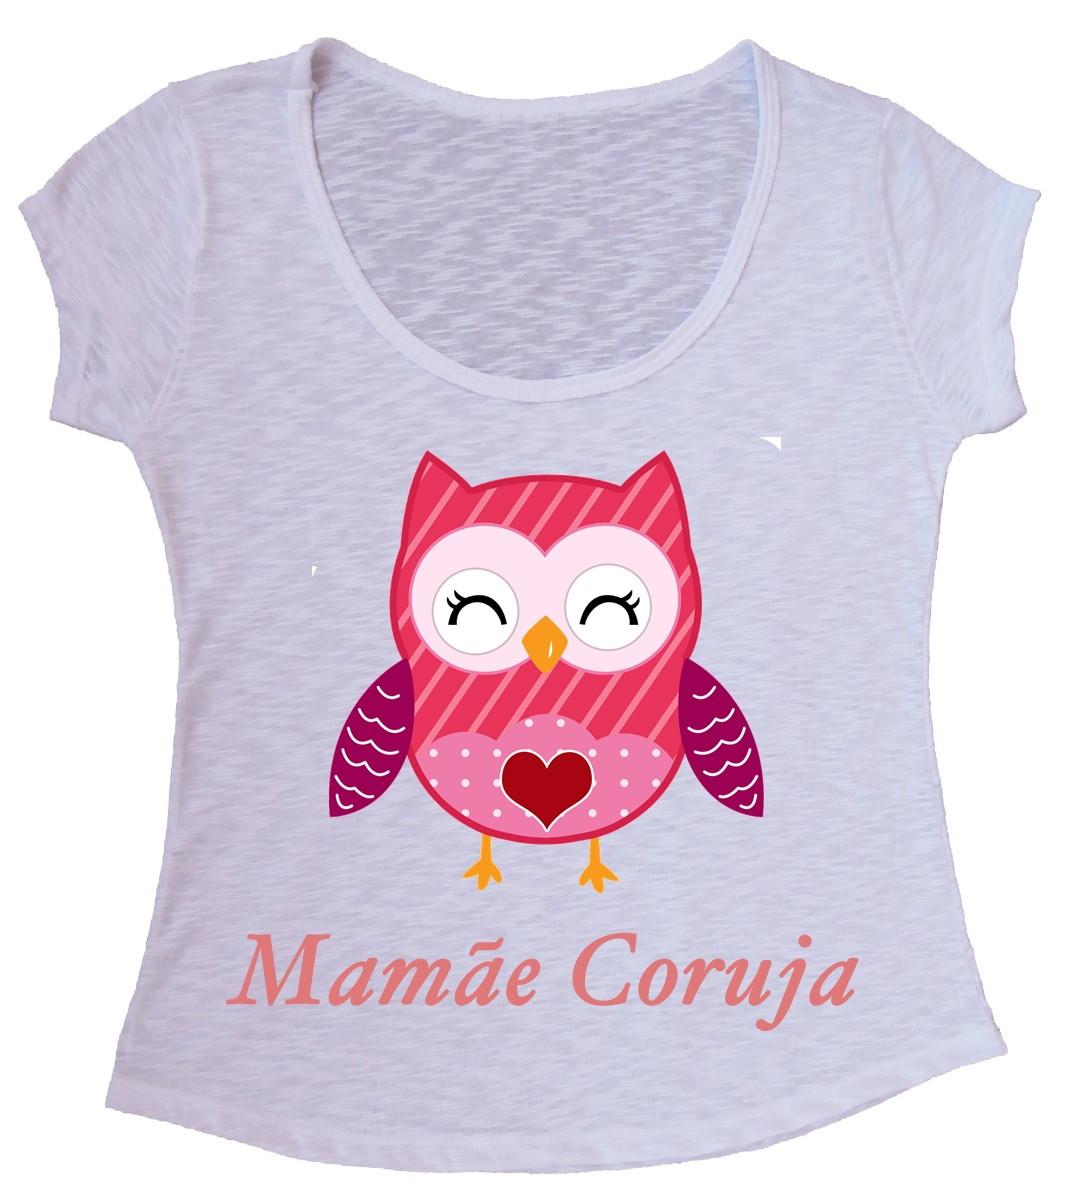 e768b64262 Blusa T-shirt Mamãe Coruja no Elo7